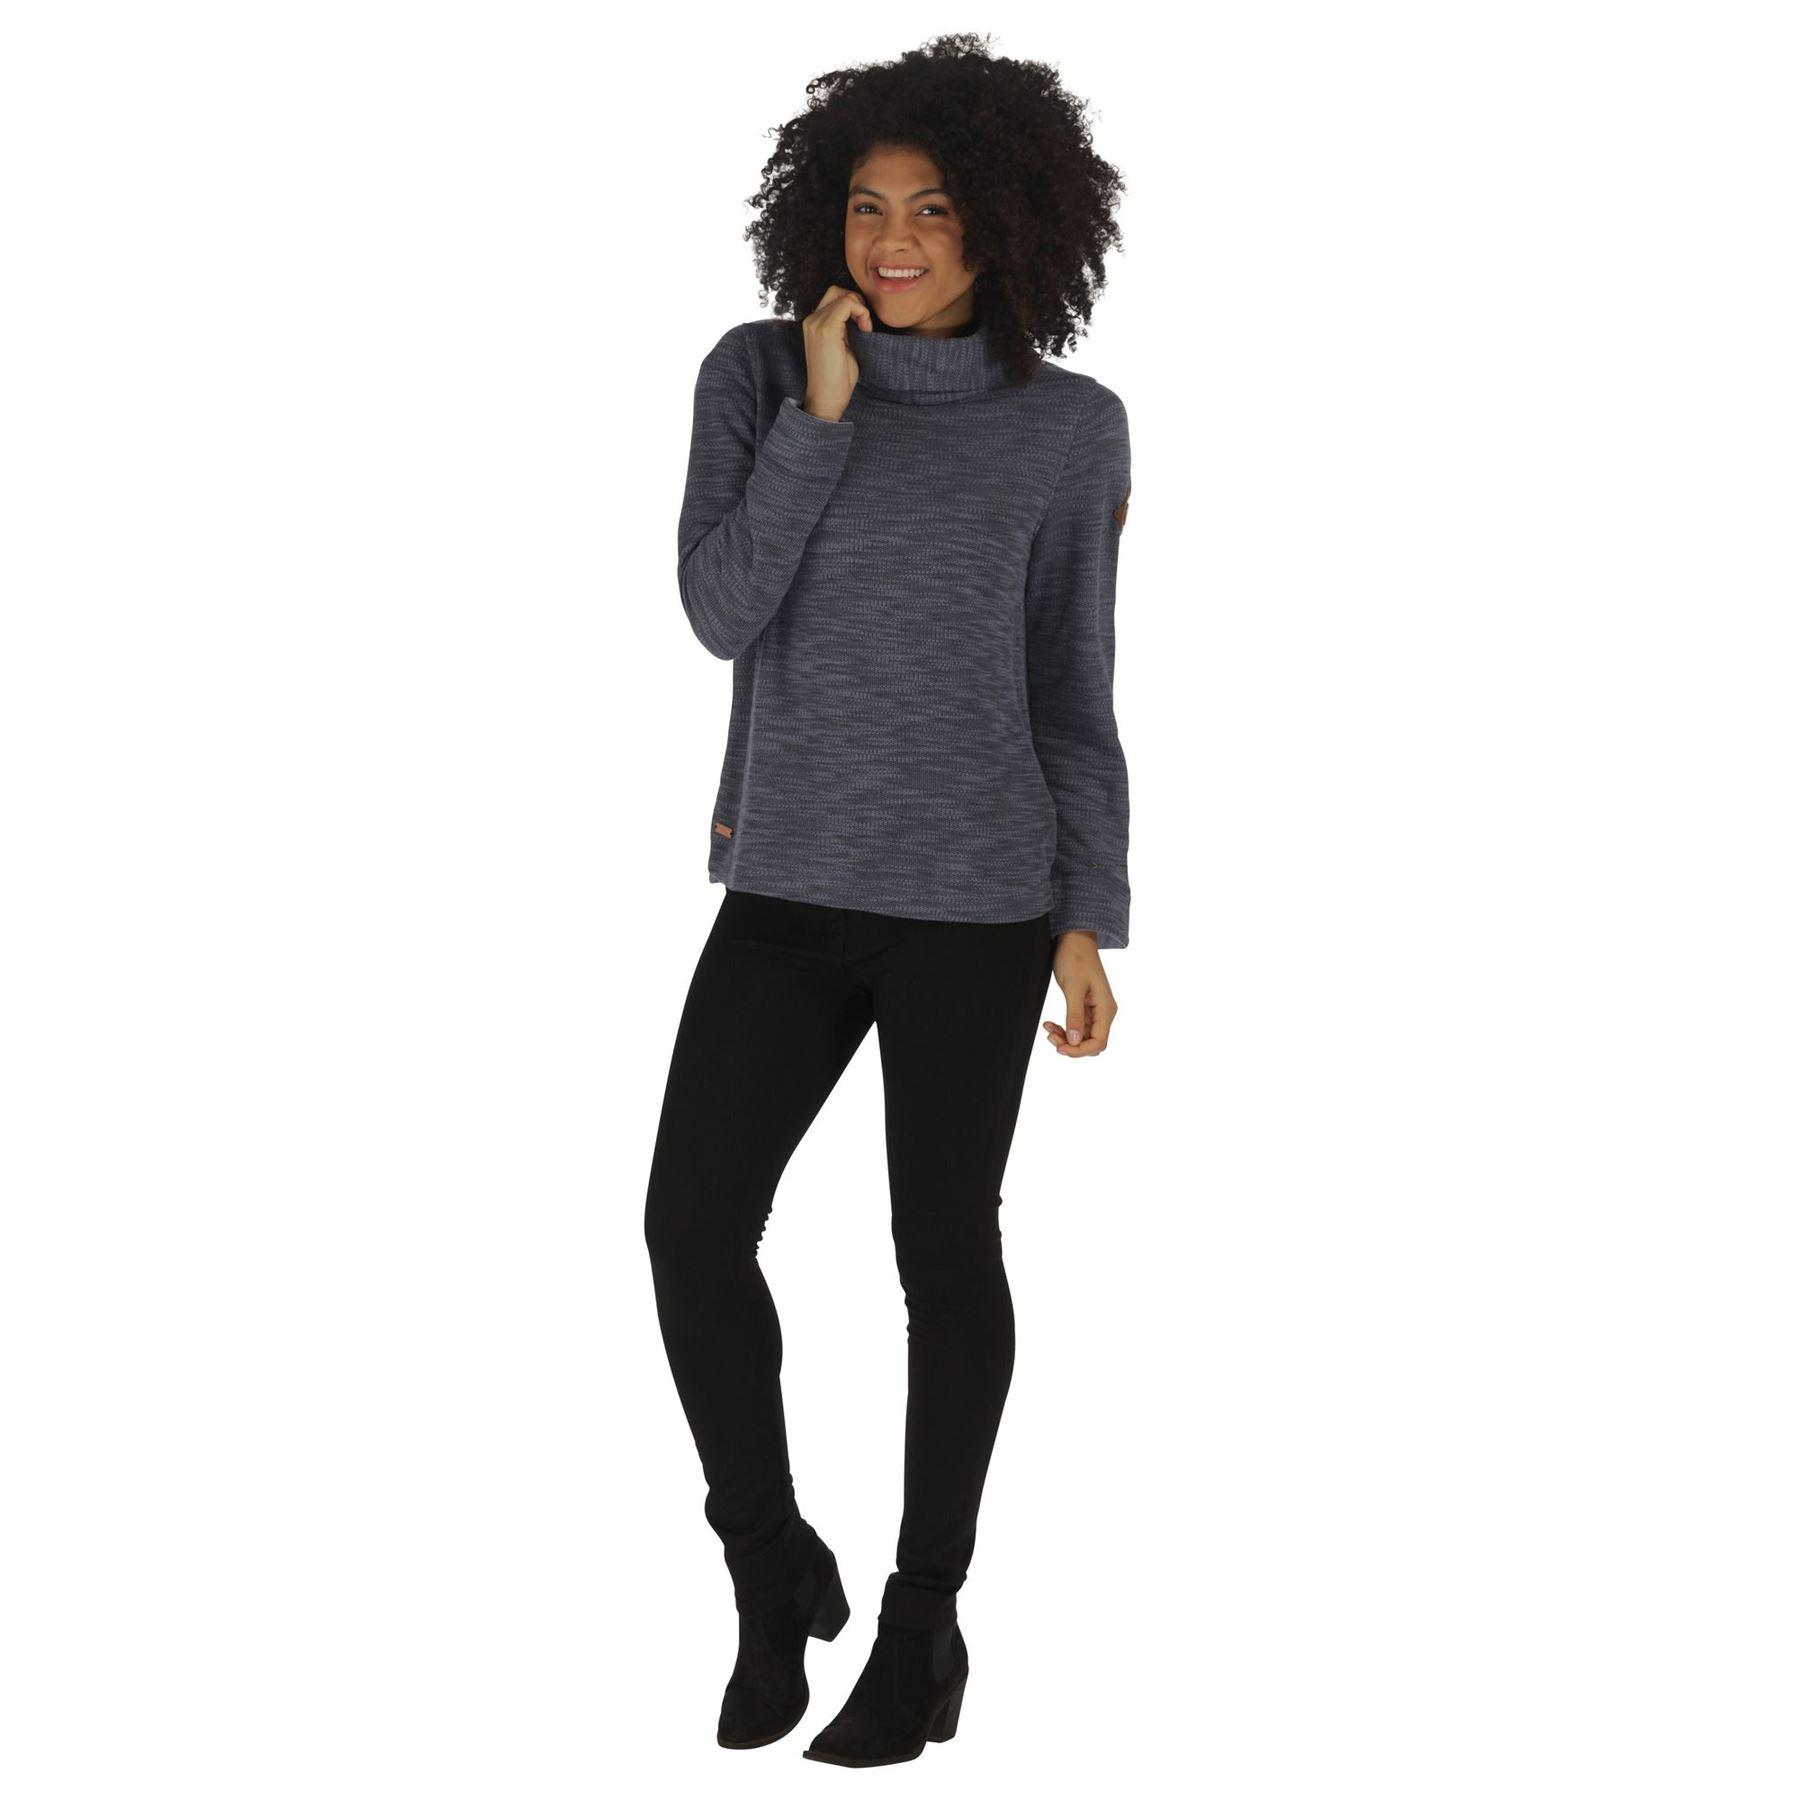 Regatta-Ceanna-Cowl-Neck-Soft-Fleece-Pull-Over-Jumper-Sweater-Top-RWA276 thumbnail 4